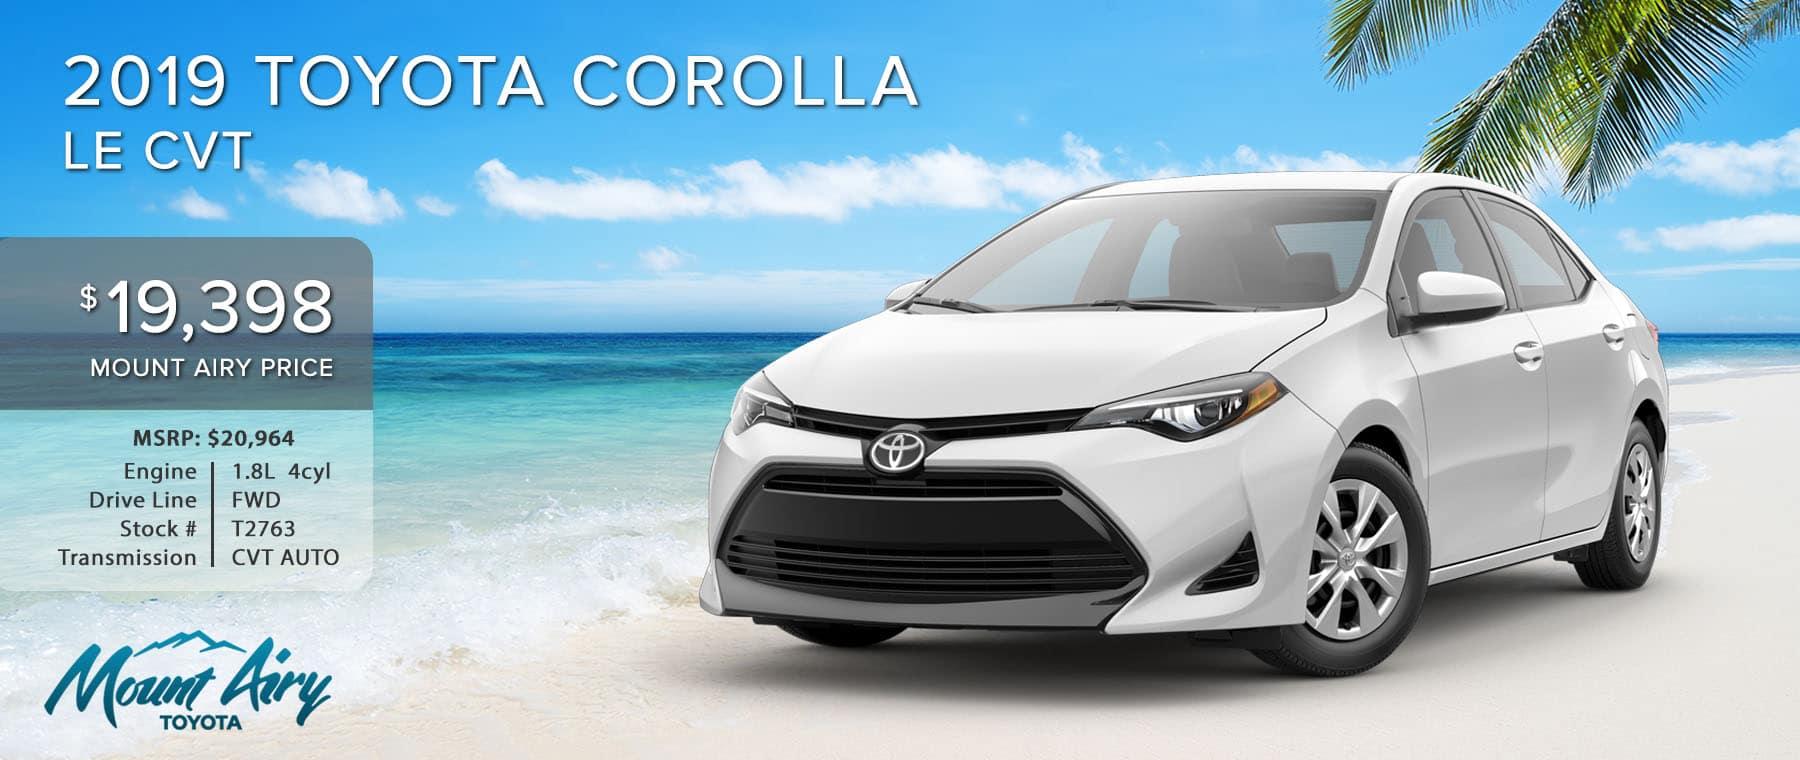 White 2019 Toyota Corolla on sale